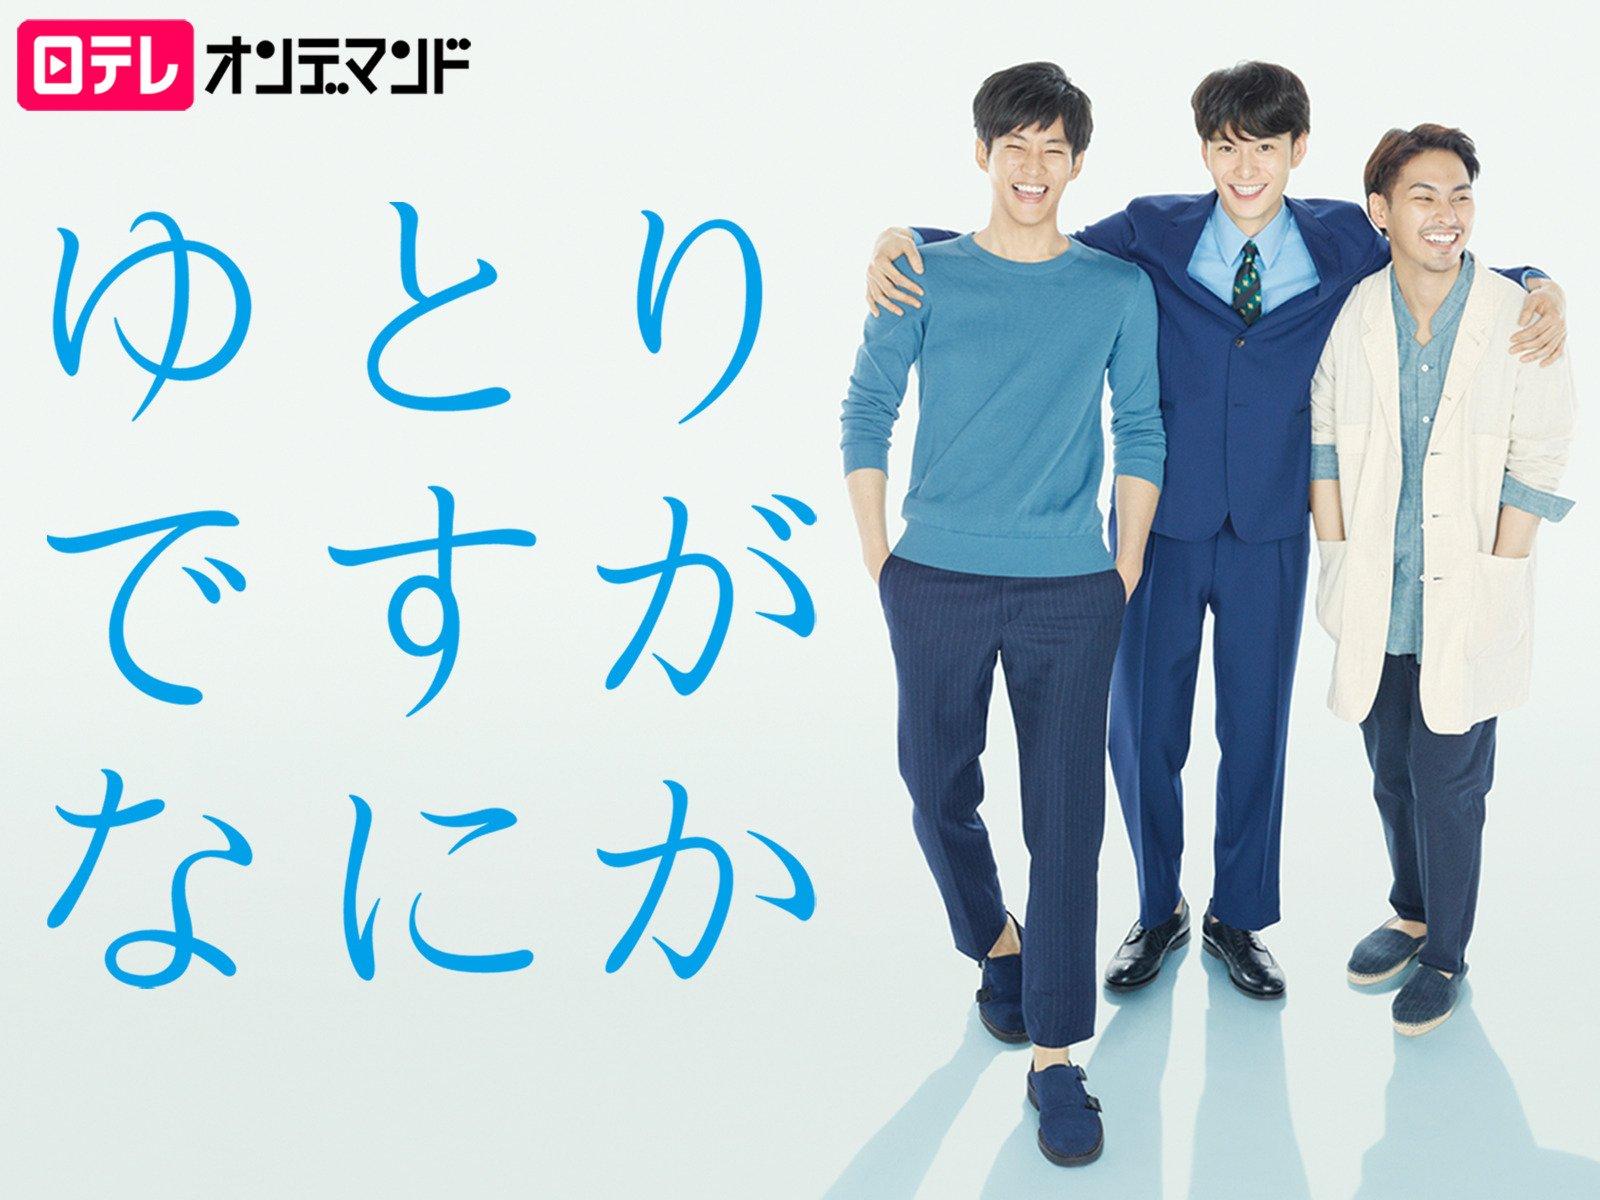 Amazon.co.jp: ゆとりですがなにかを観る   Prime Video